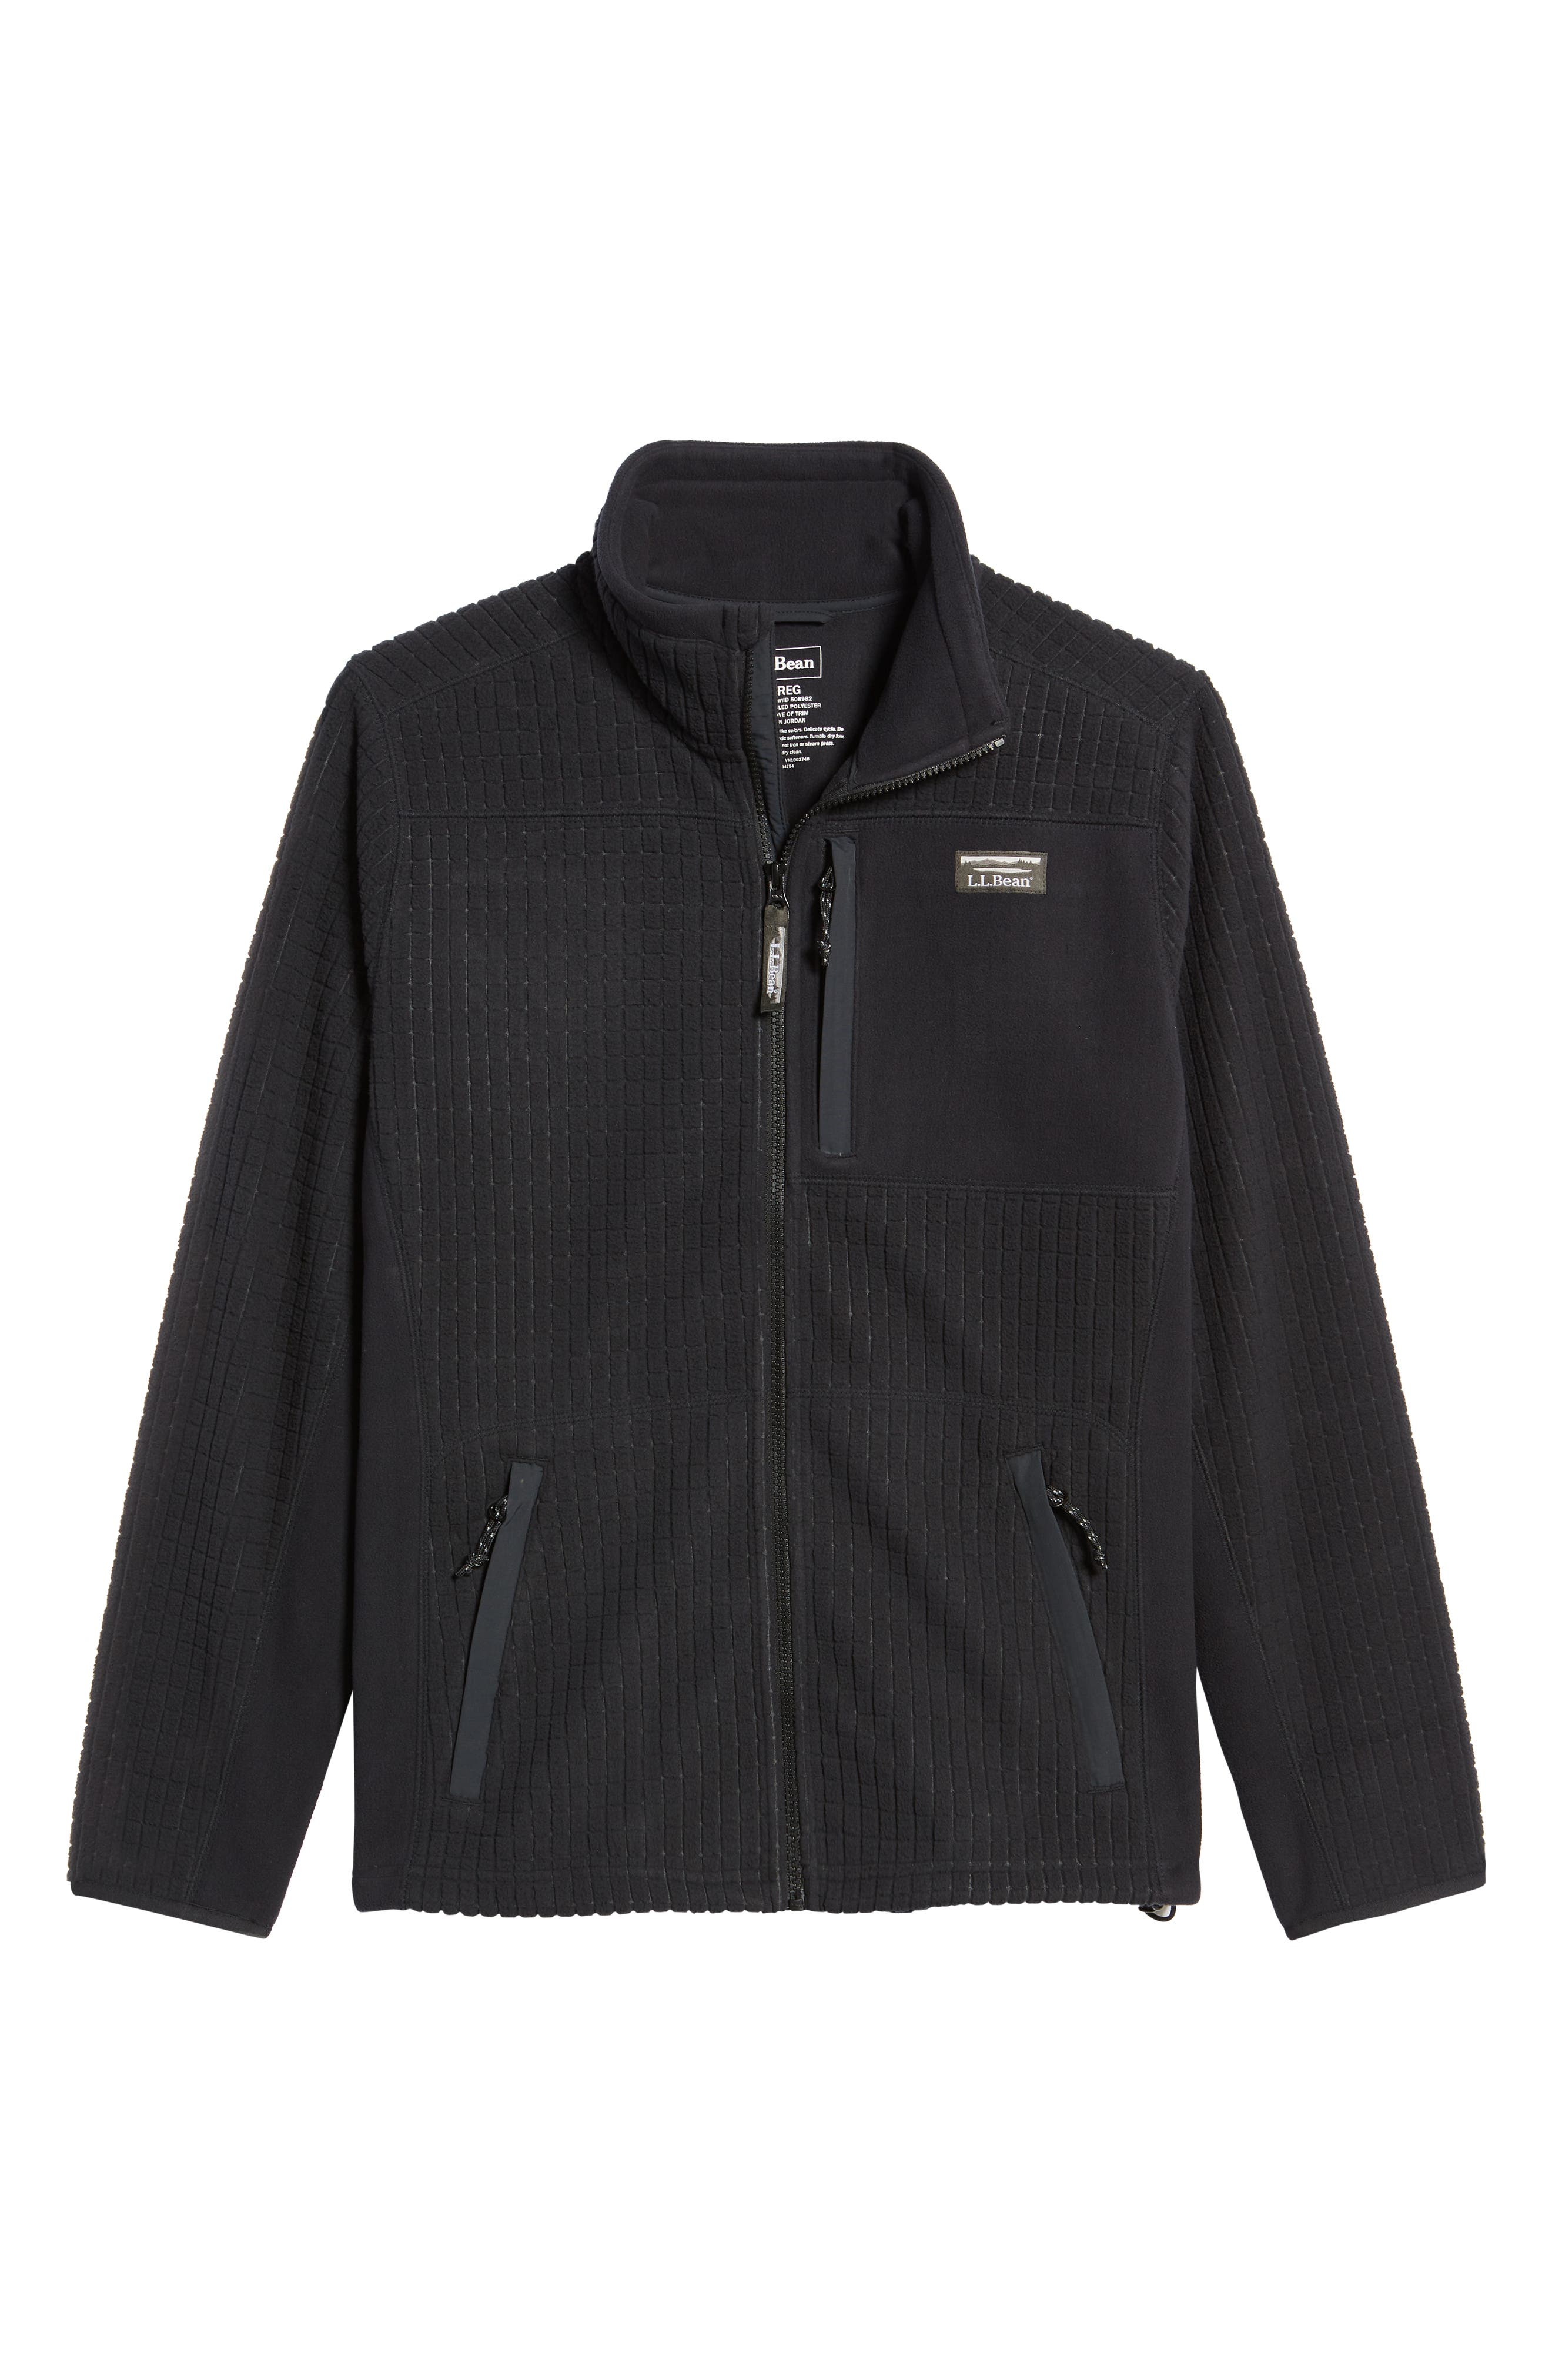 Men's L.l. Bean Men's Mountain Classic Windproof Fleece Jacket